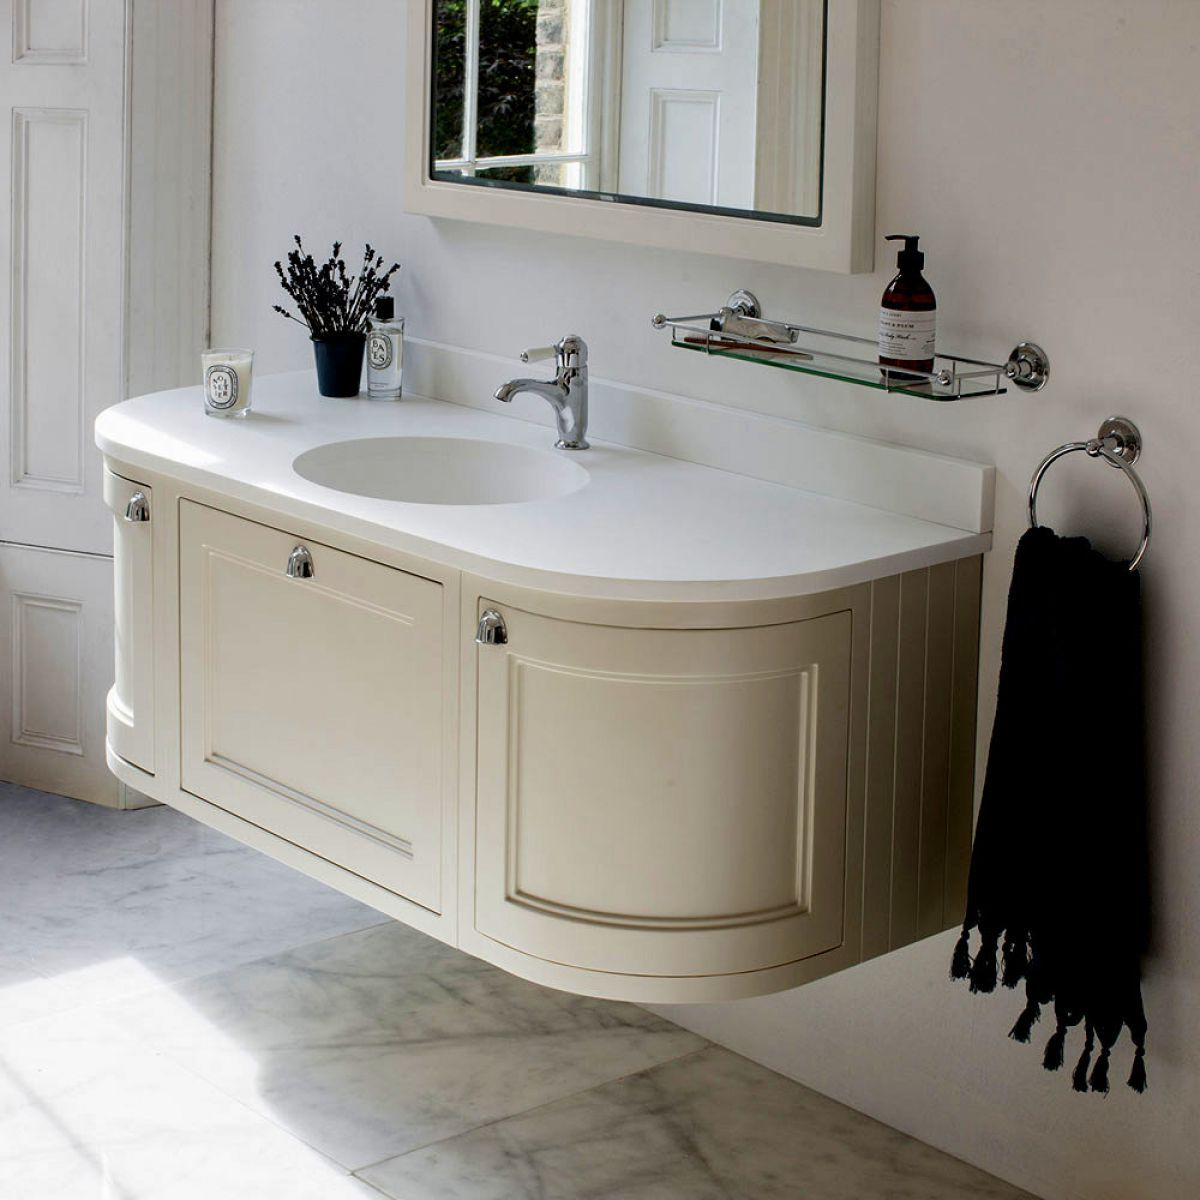 Bathroom units uk - Burlington 134 Curved Wall Hung Vanity Unit Uk Bathrooms